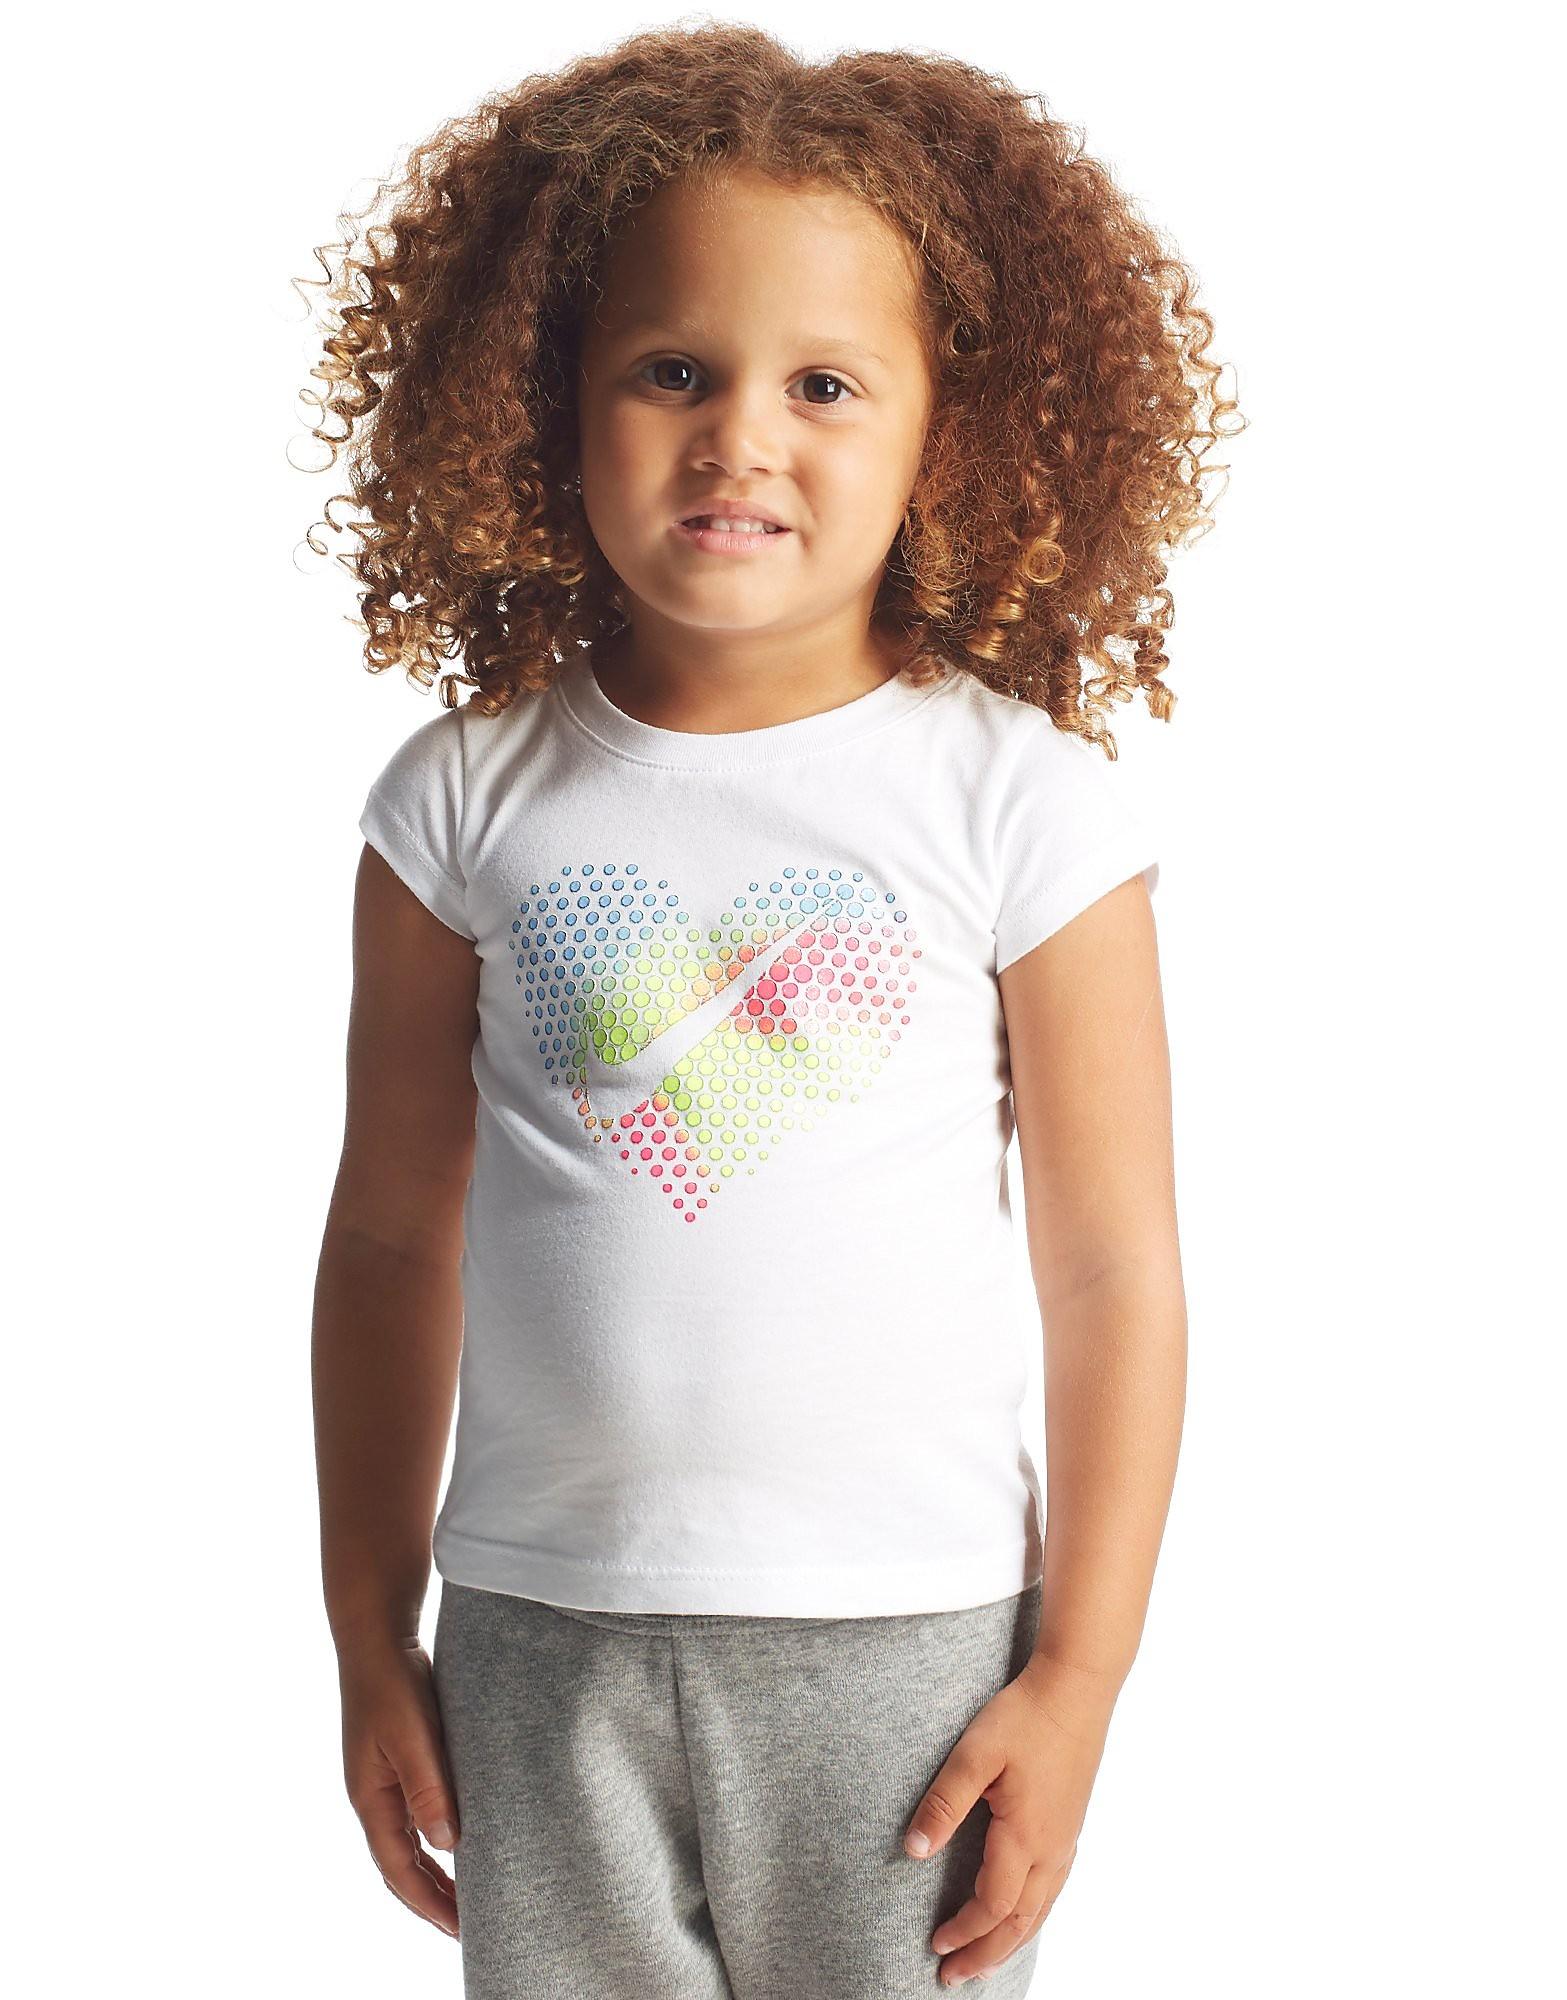 Nike Girls' Swoosh T-Shirt Infant